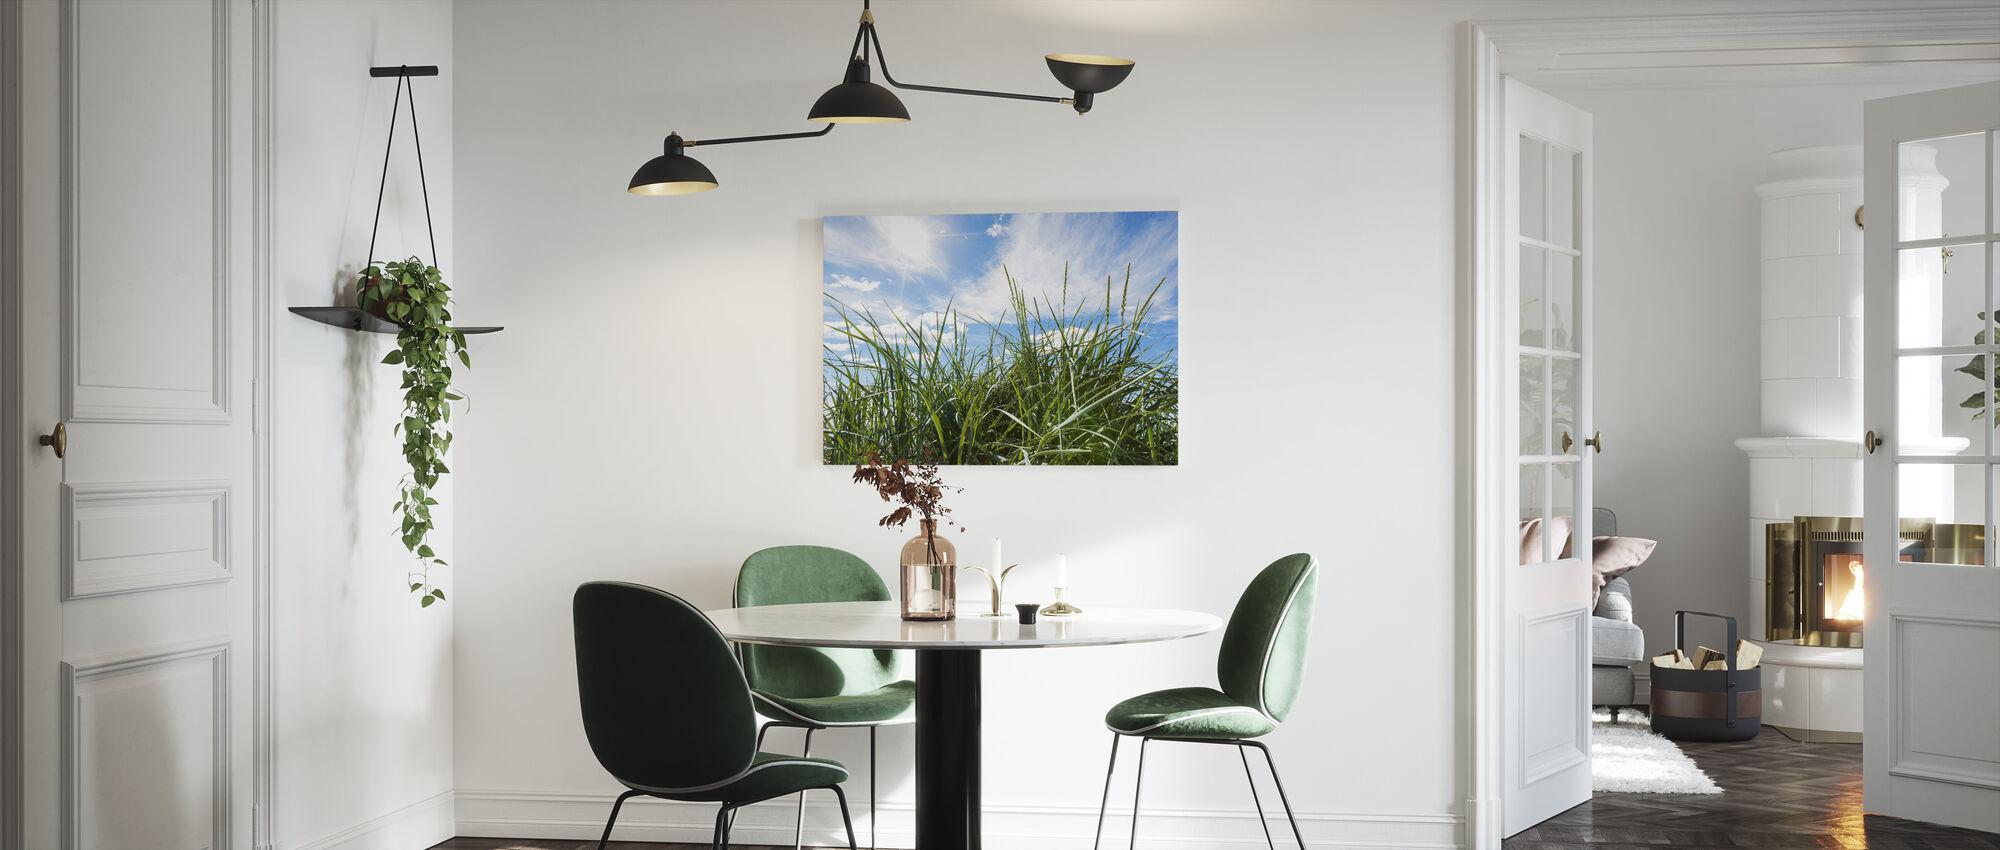 Groen gras & blauwe hemel - Canvas print - Keuken